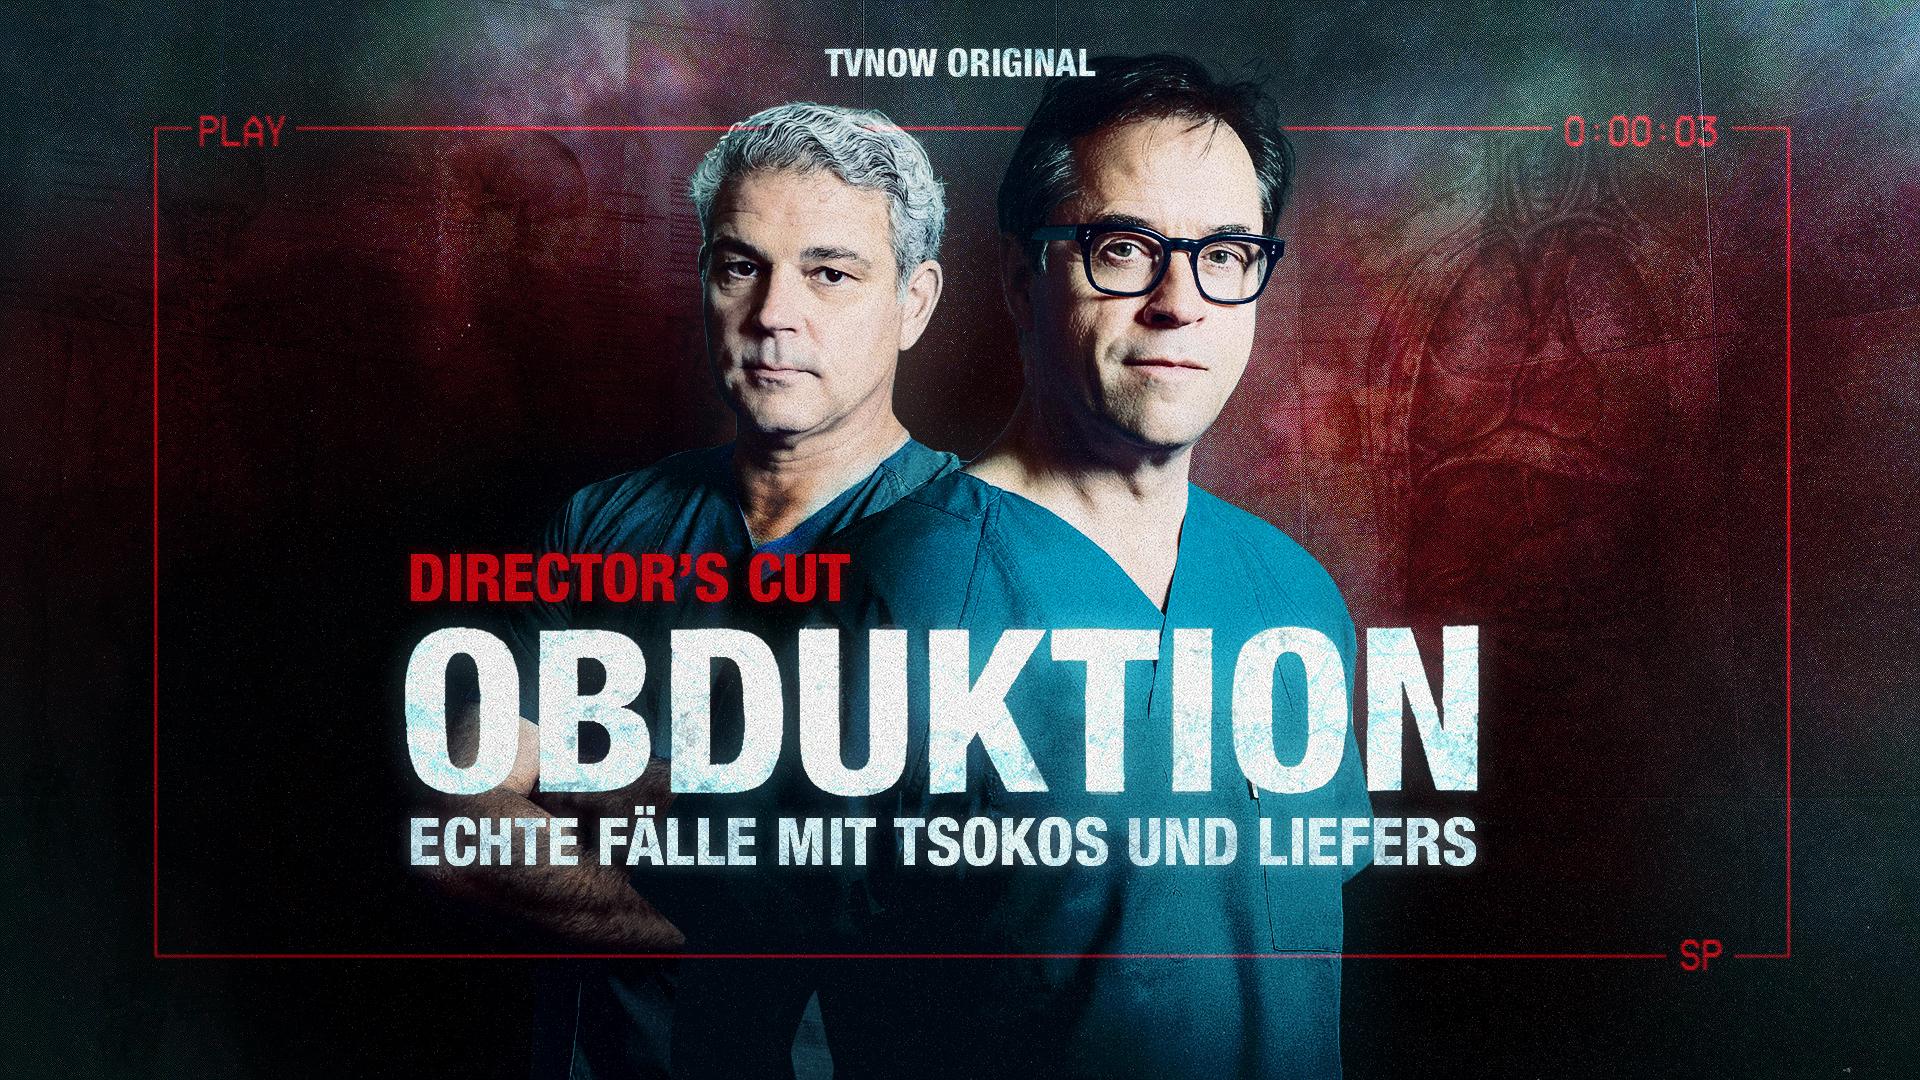 Obduktion – Echte Fälle mit Tsokos und Liefers Directors Cut